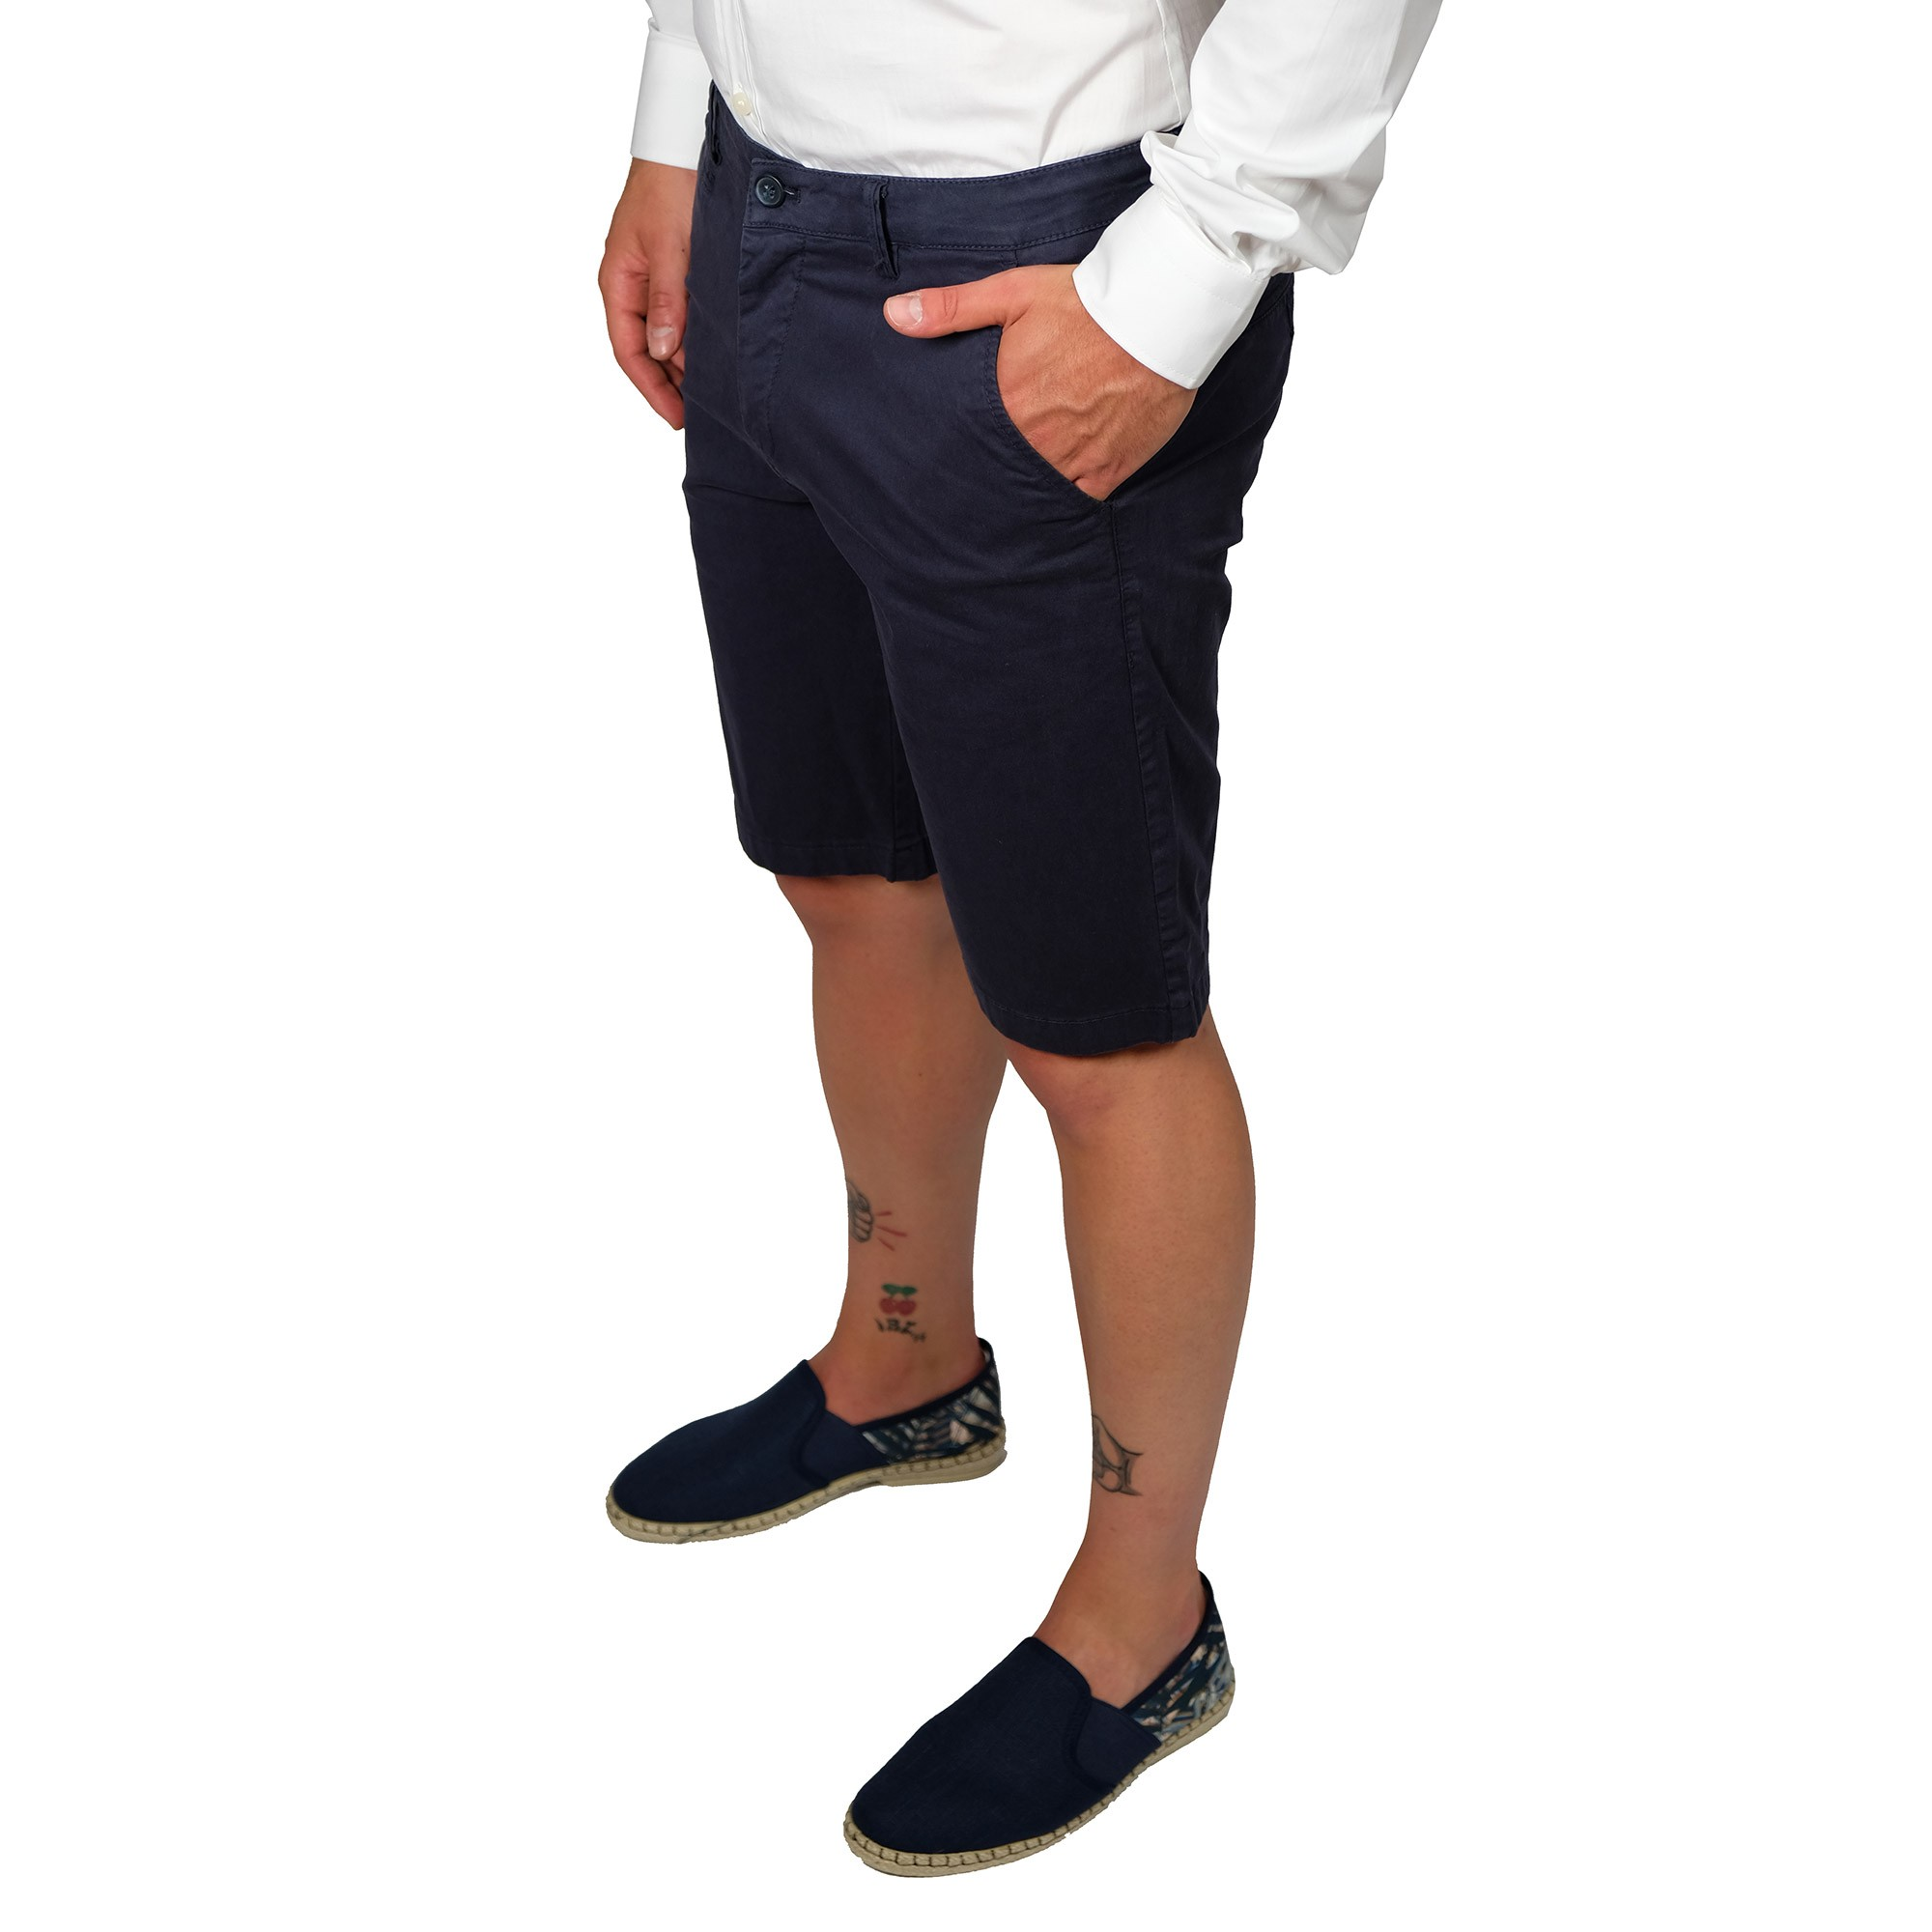 Bermuda-Uomo-Cotone-Jeans-Pantaloncini-Pantaloni-Corti-Tasca-America-Slim-Shorts miniatura 6